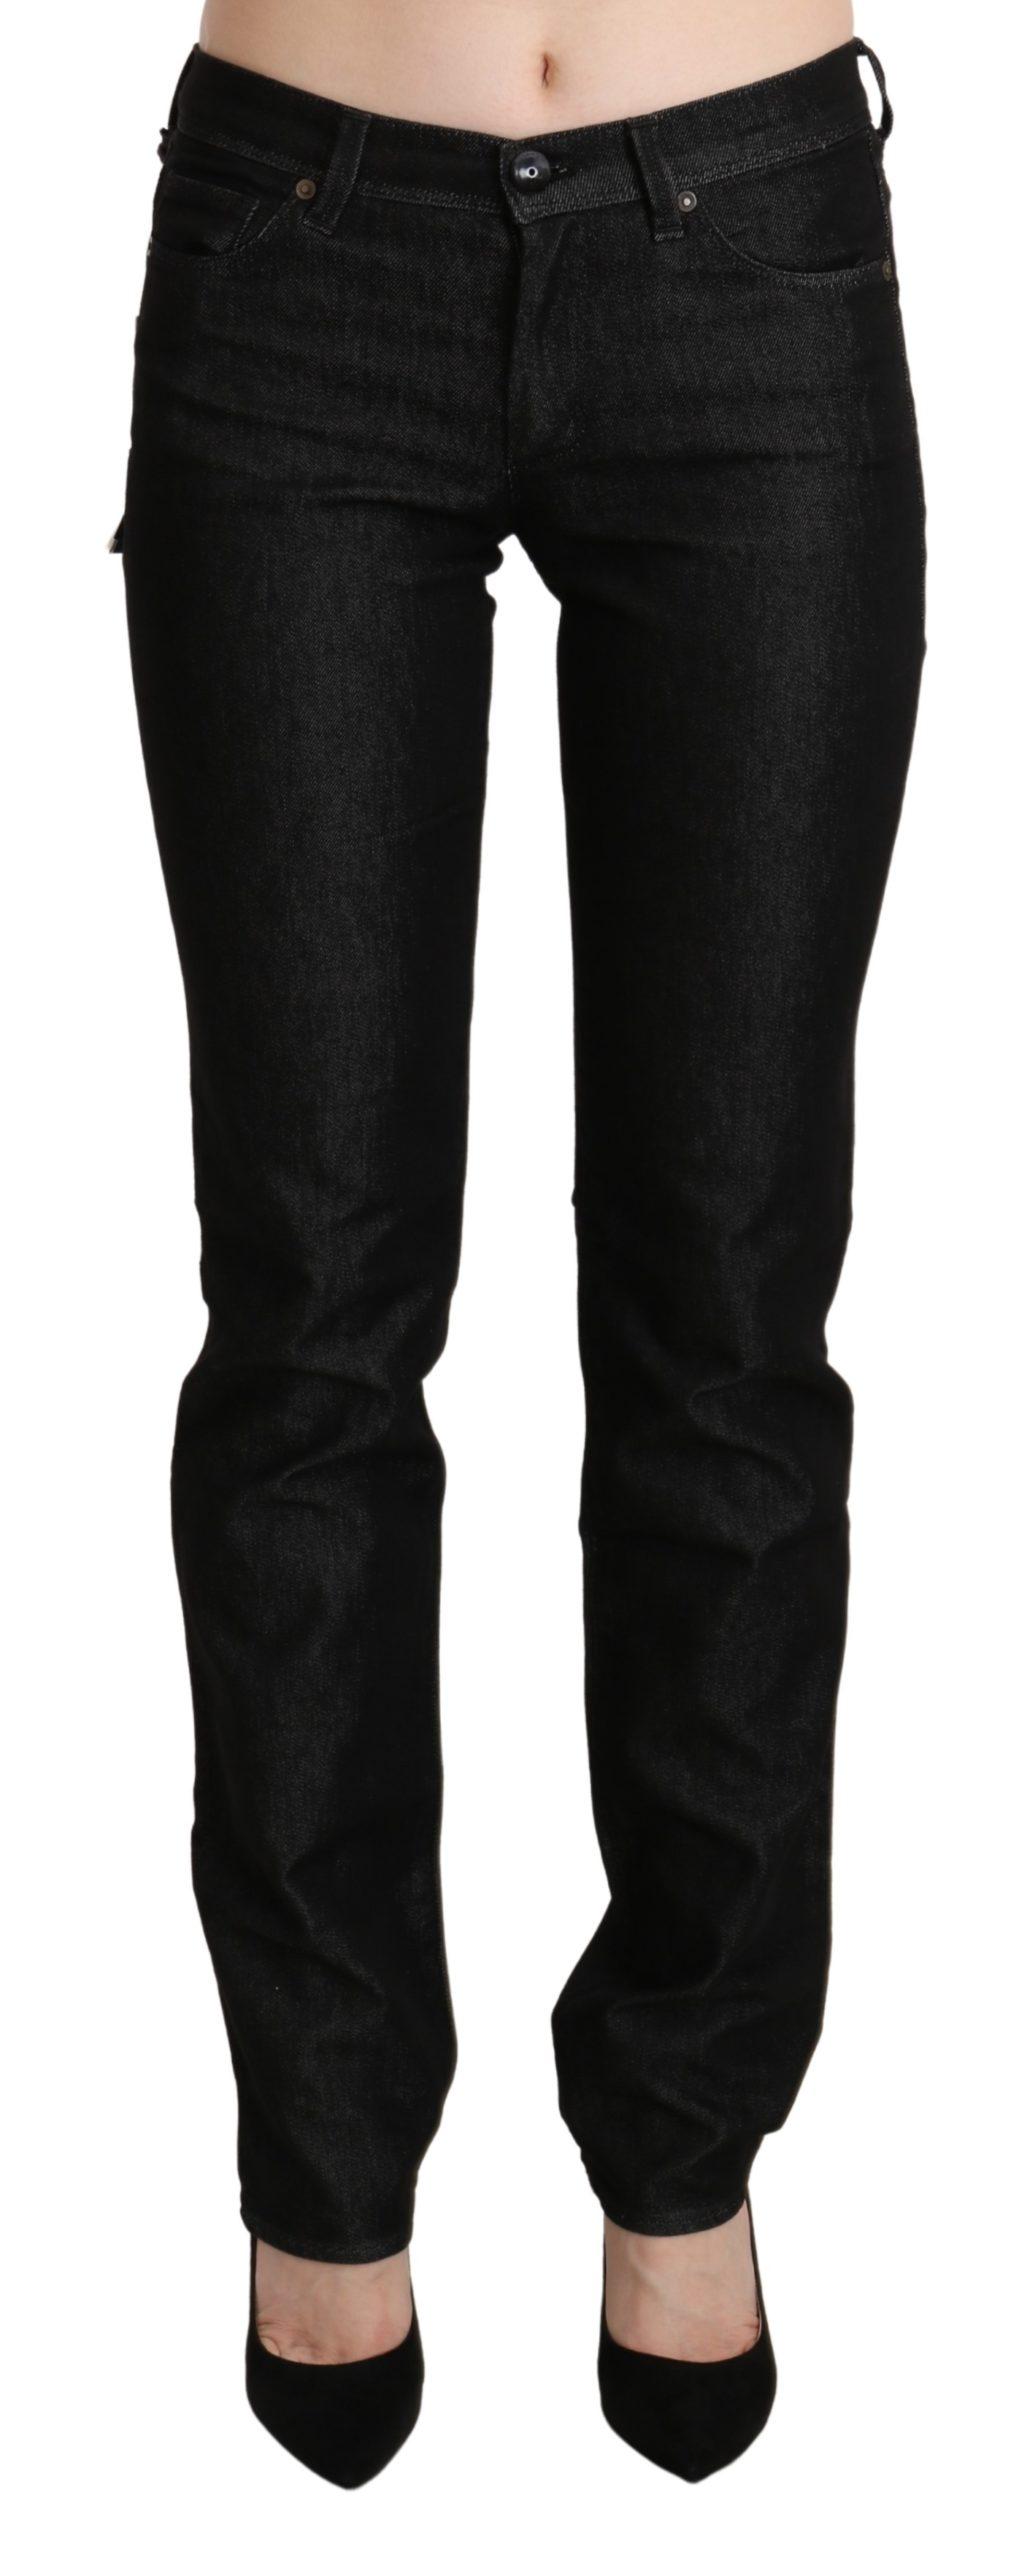 Black Mid Waist Skinny Slim Denim Trouser - W28